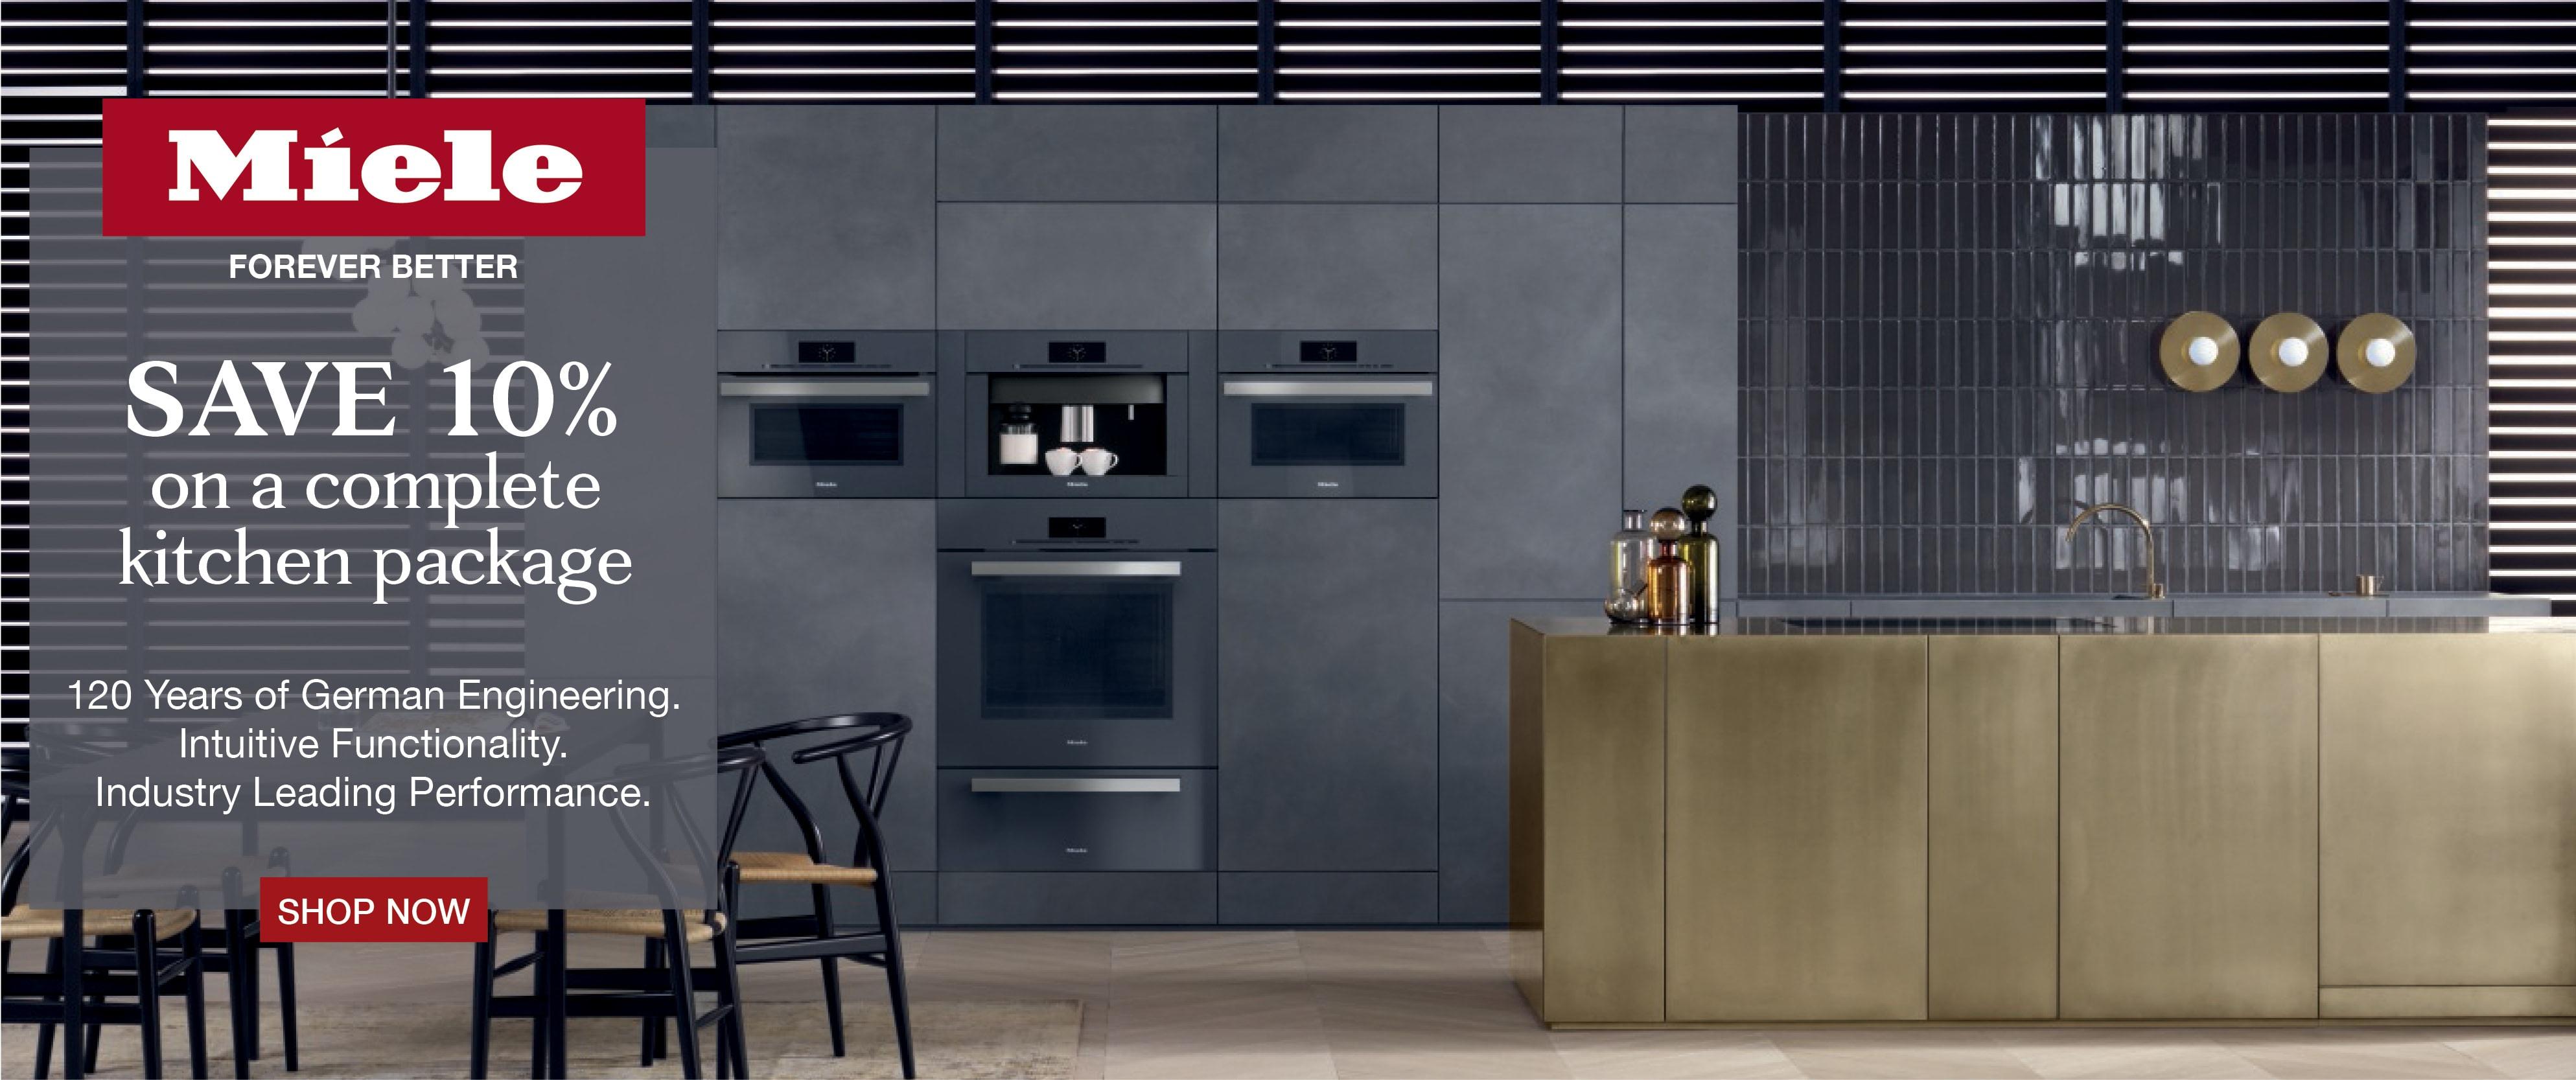 Buy Appliances Online Home And Kitchen Appliances Aj Madison